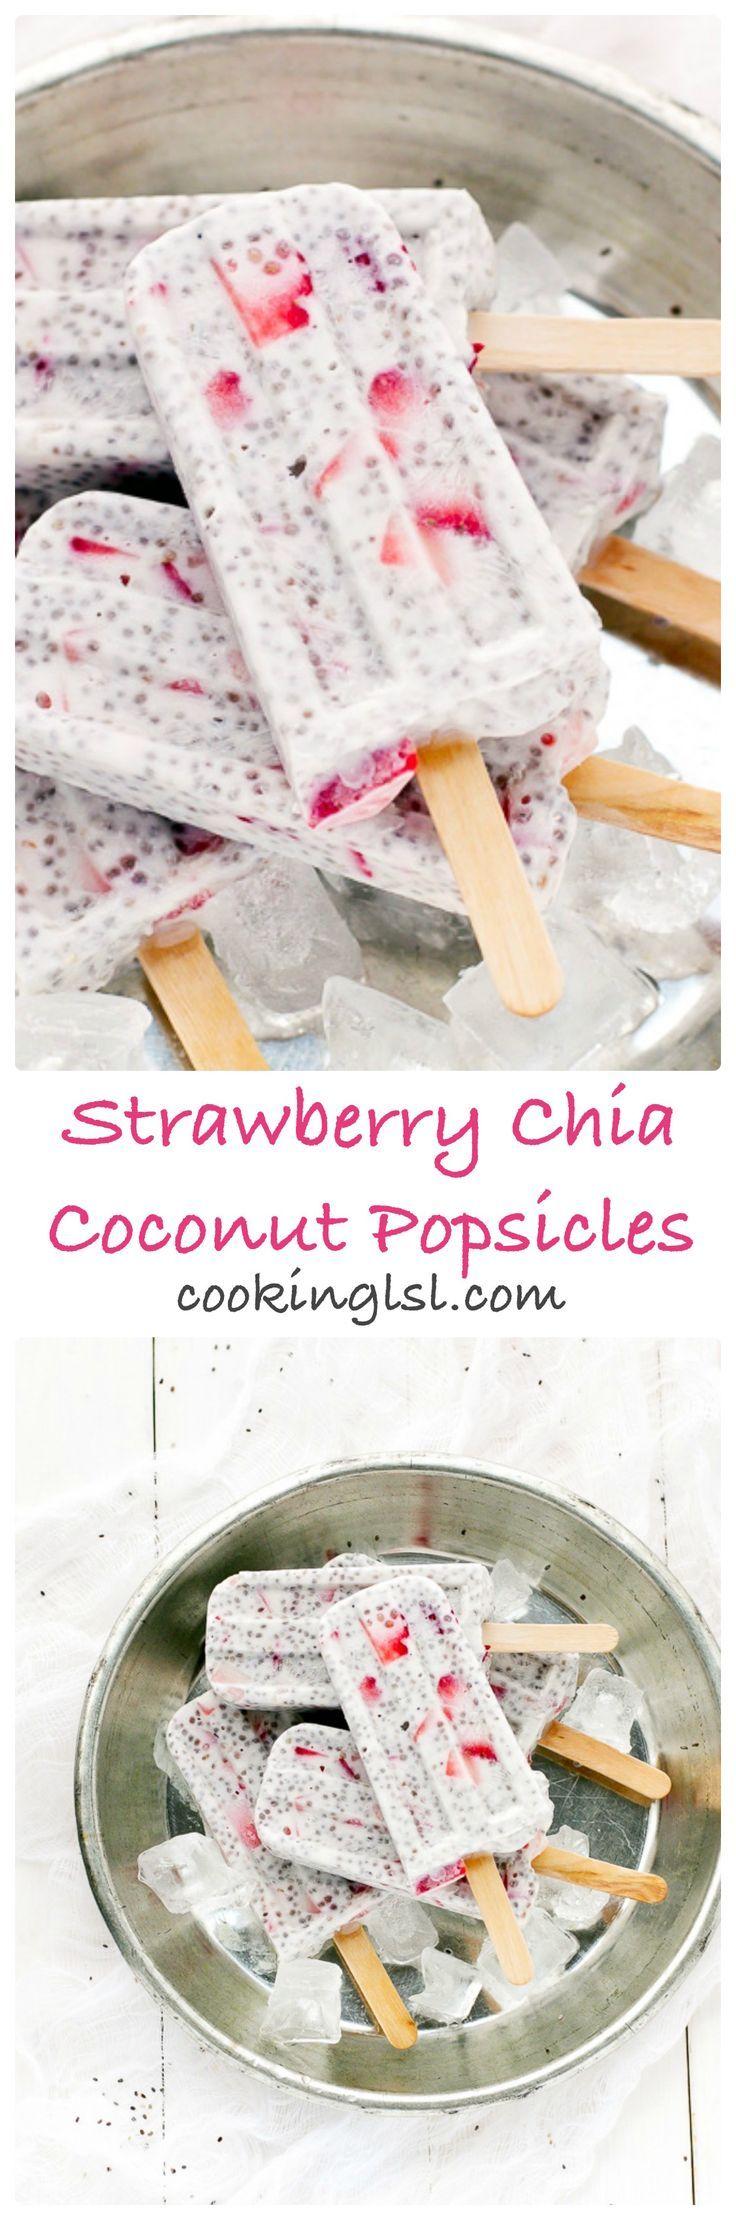 Strawberry-Chia-Coconut-Popsicles-recipe                                                                                                                                                      Más